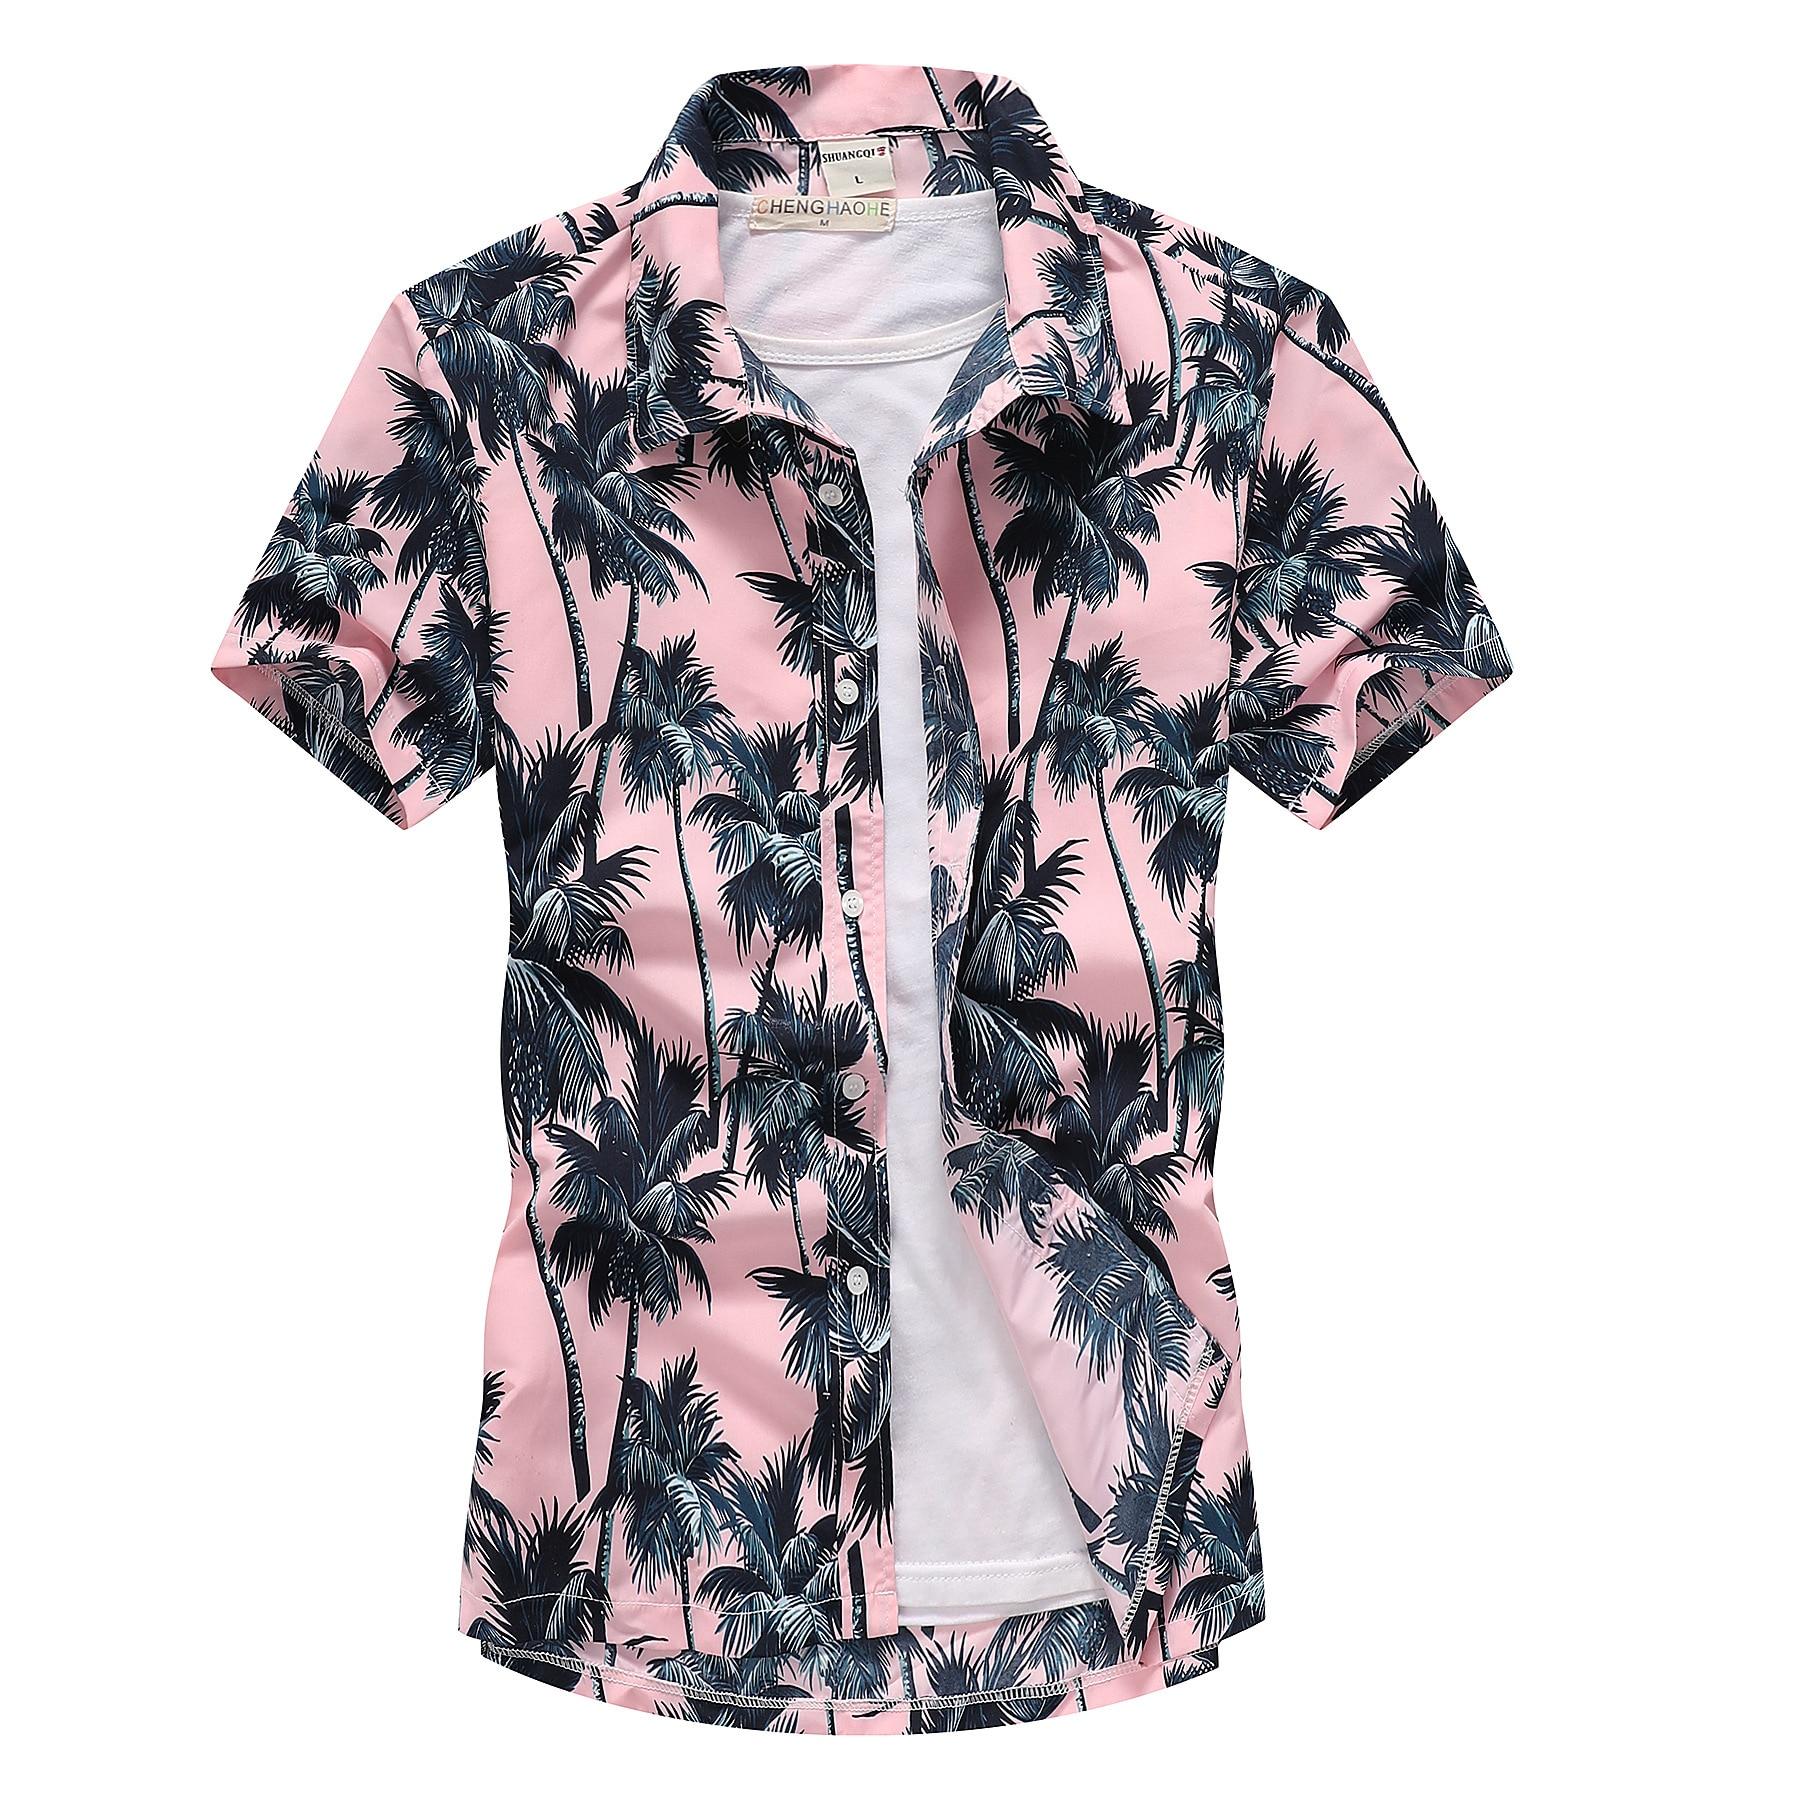 2021 Fashion Mens Short Sleeve Hawaiian Shirt Fast drying Plus Size Asian Size M-5XL Summer Casual Floral Beach Shirts For Men 2